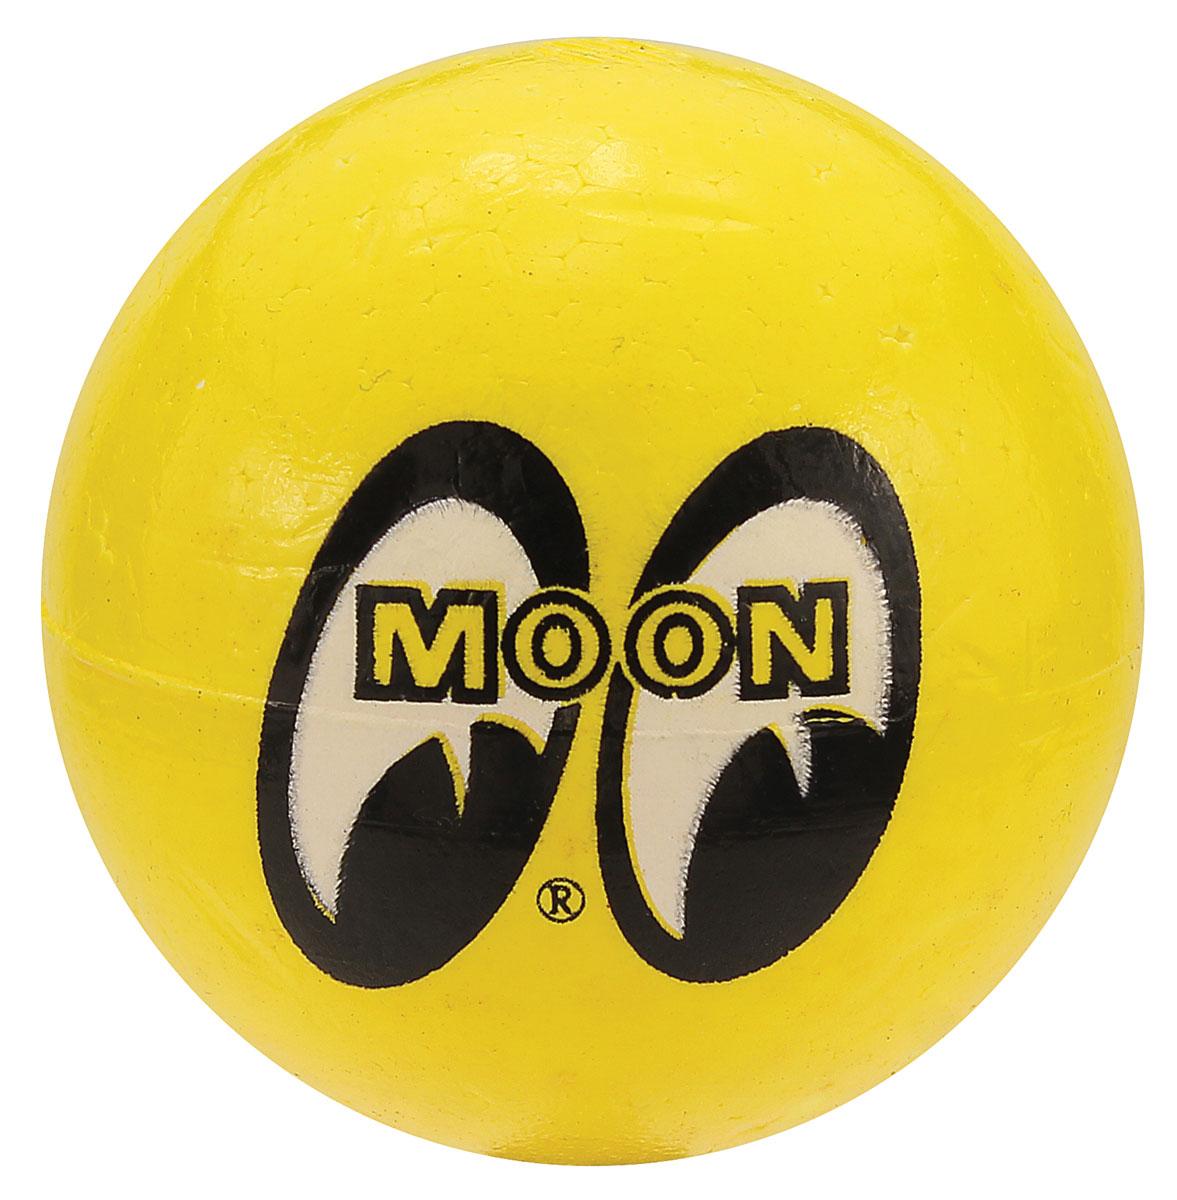 Antenna Ball, Mooneyes